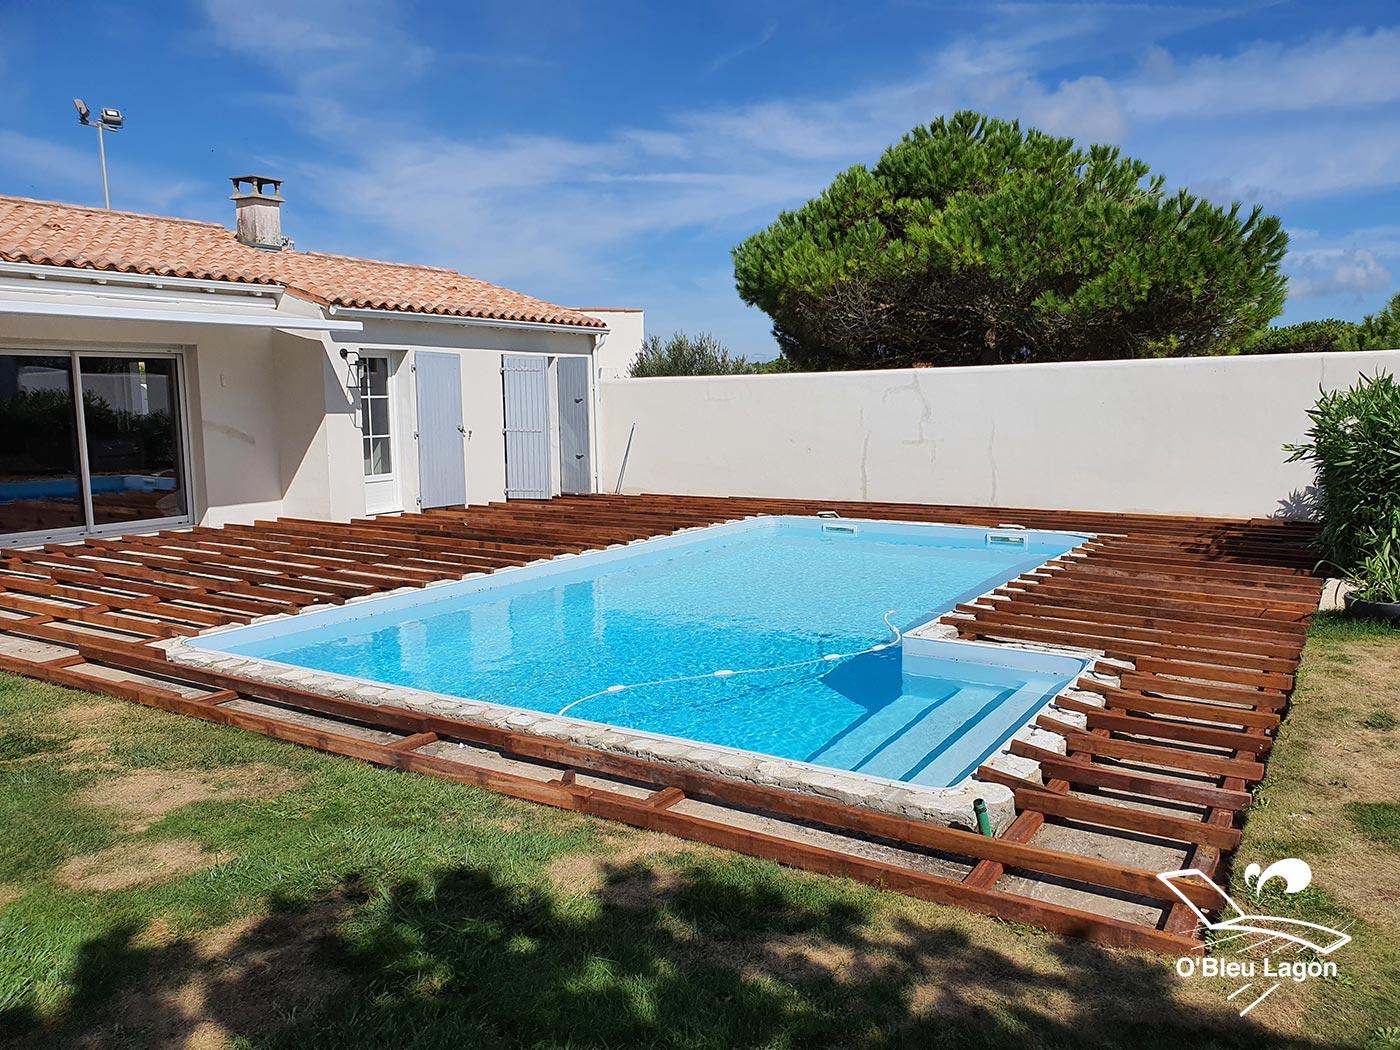 artisan terrasse de piscine en bois exotique cumaru vendee